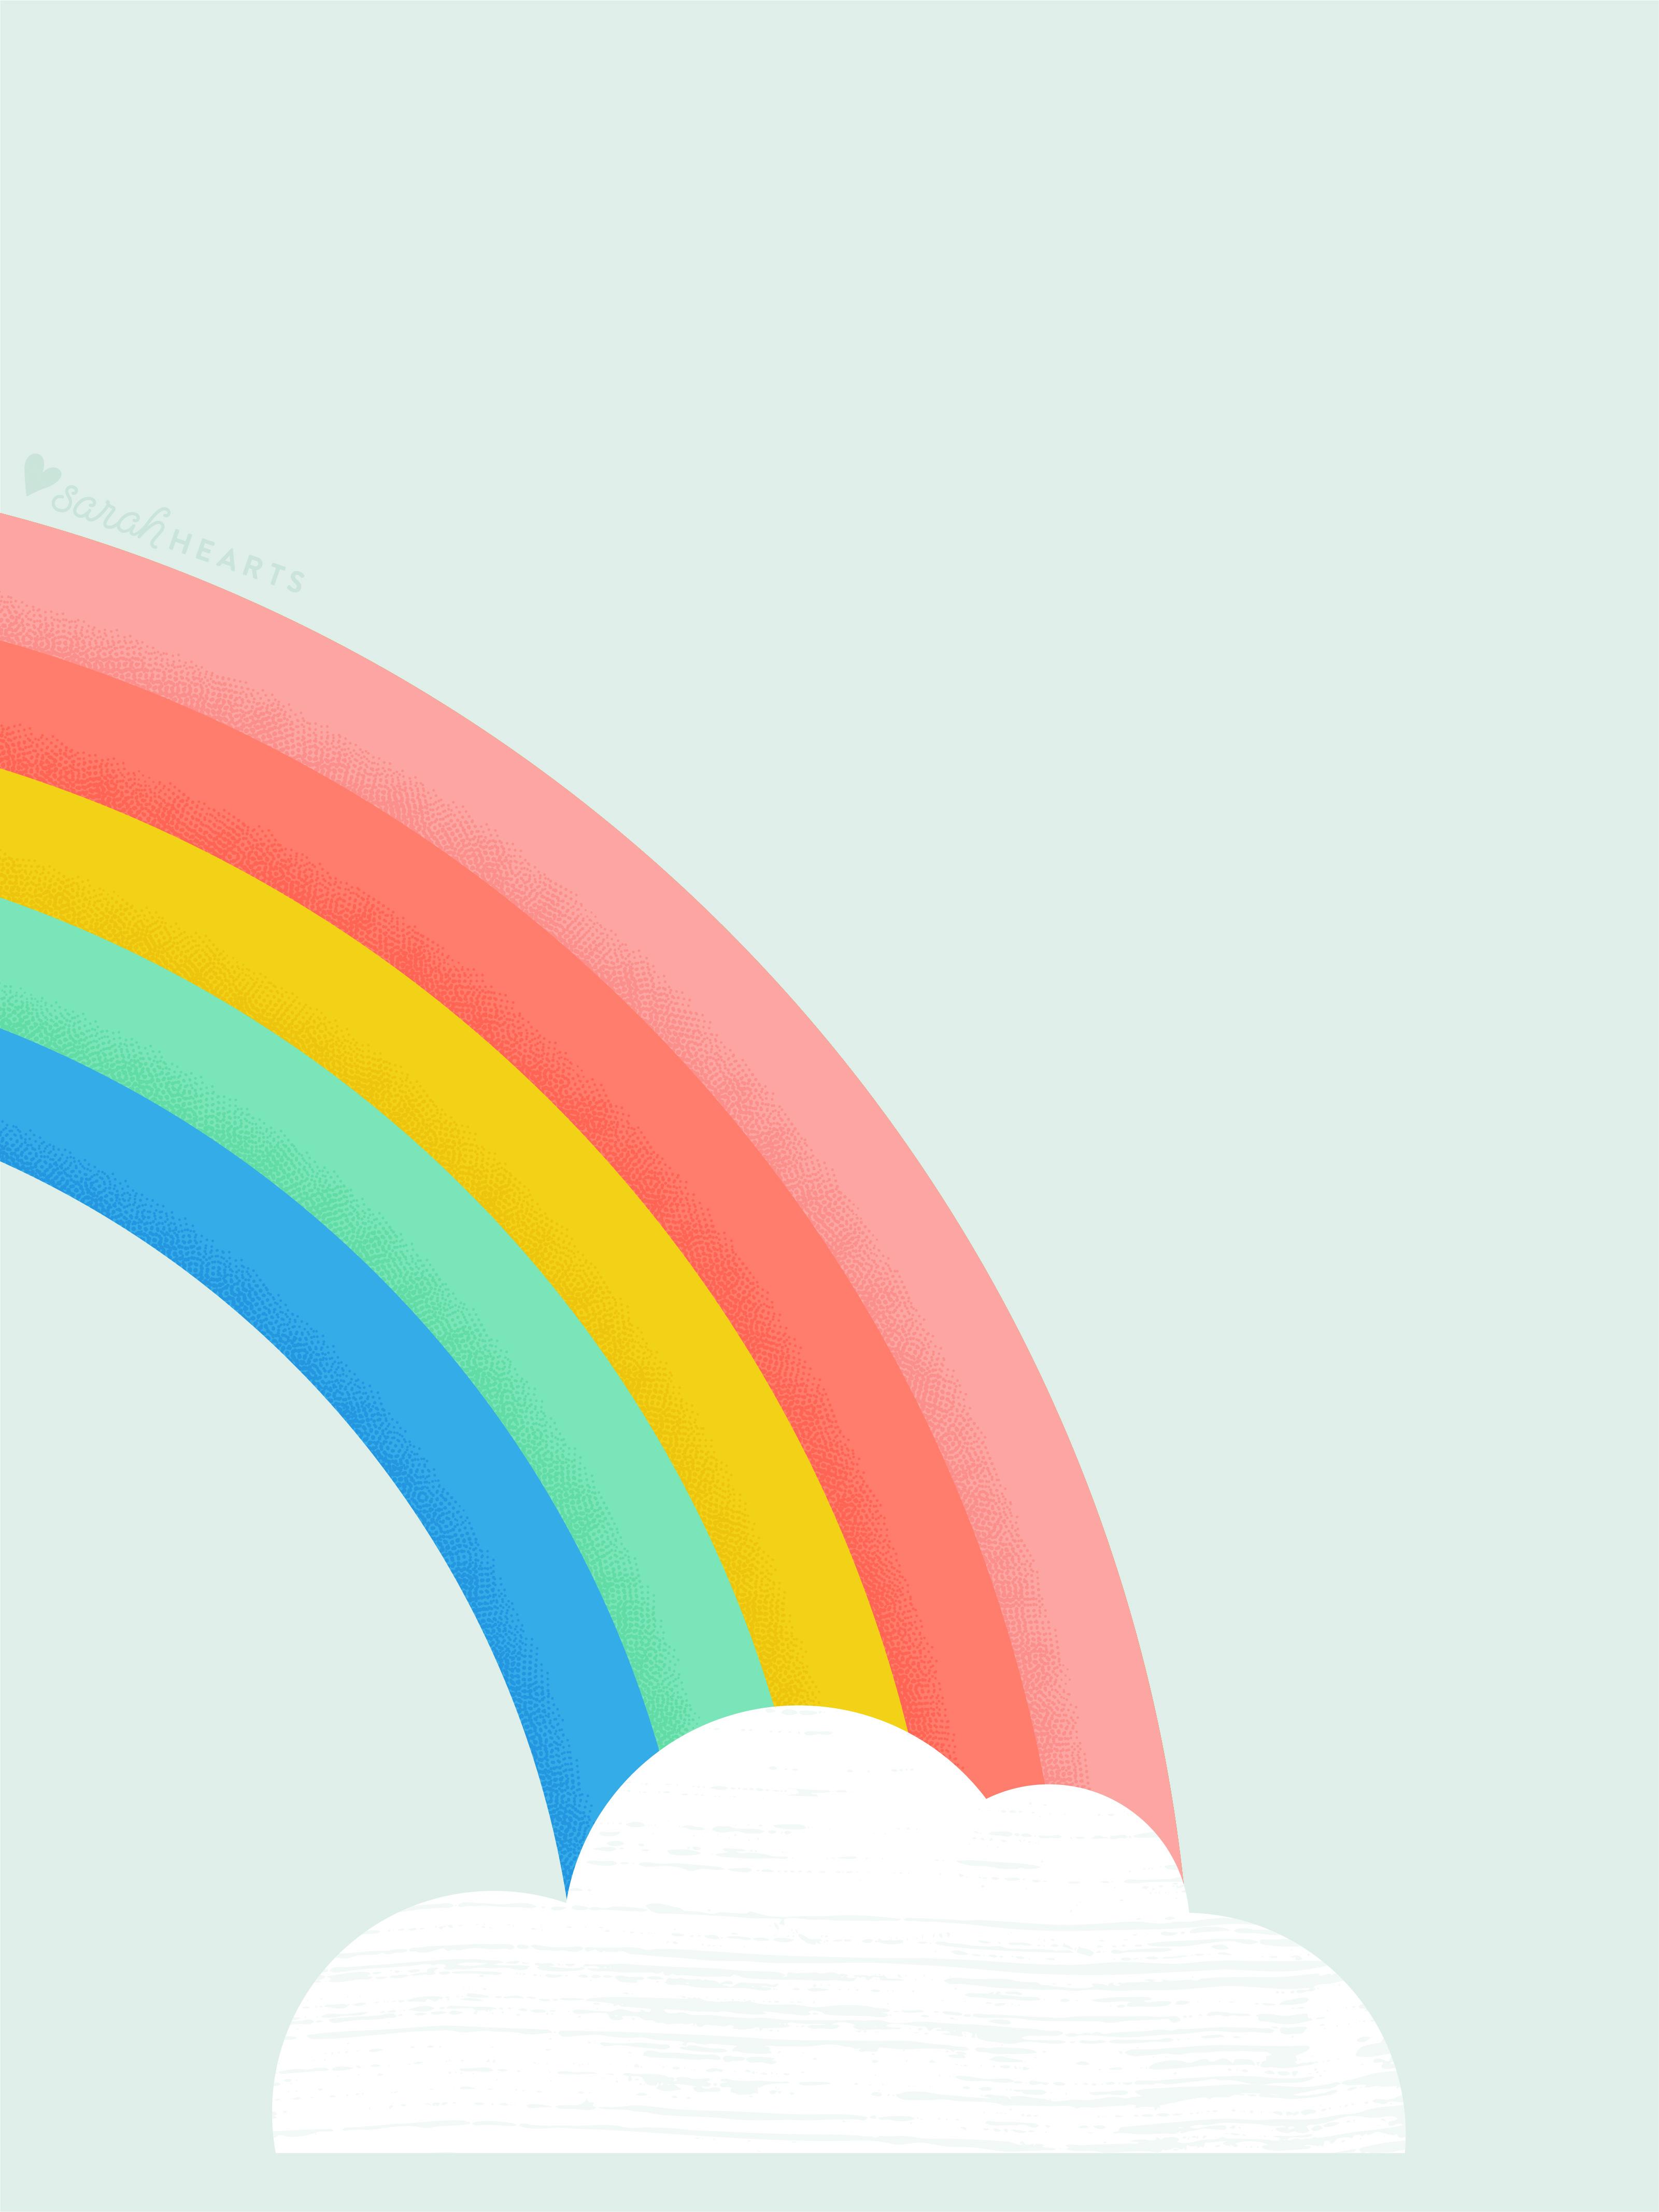 Iphone Wallpaper Quote Pink Rainbow March 2017 Calendar Wallpaper Sarah Hearts